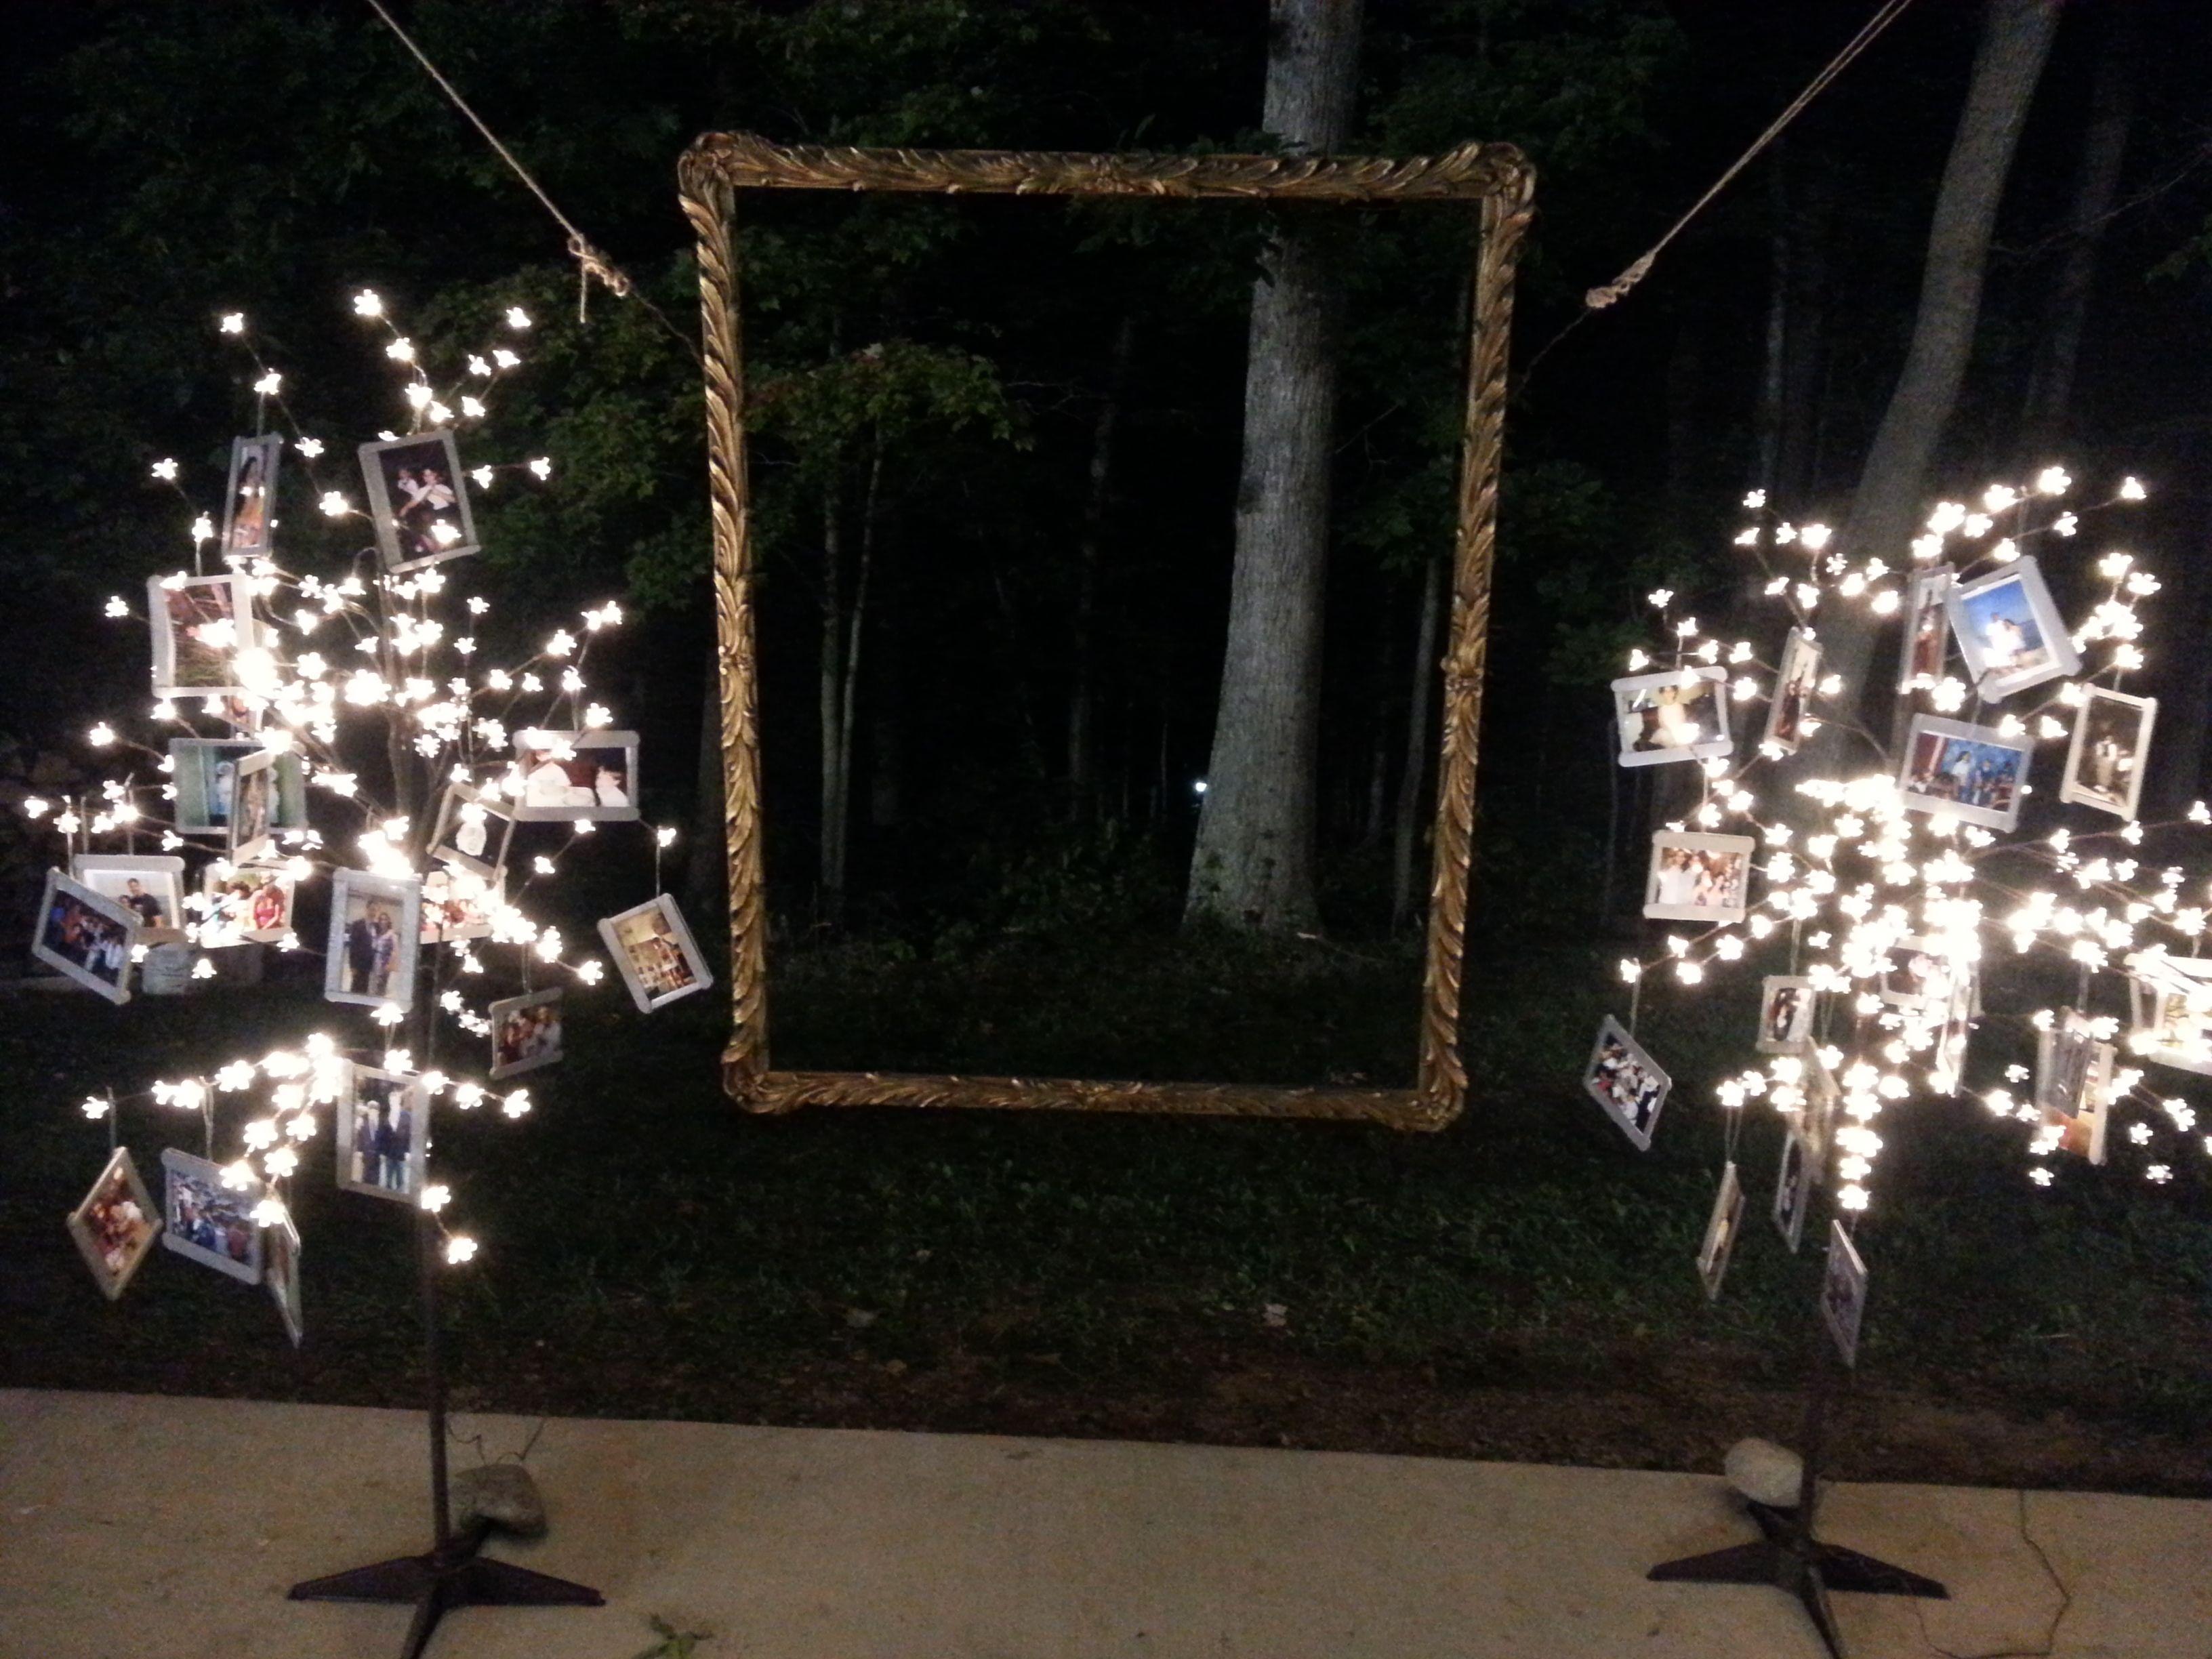 SUPER FUN Idea For An Outdoor OR Indoor Wedding DIY Photo Booth